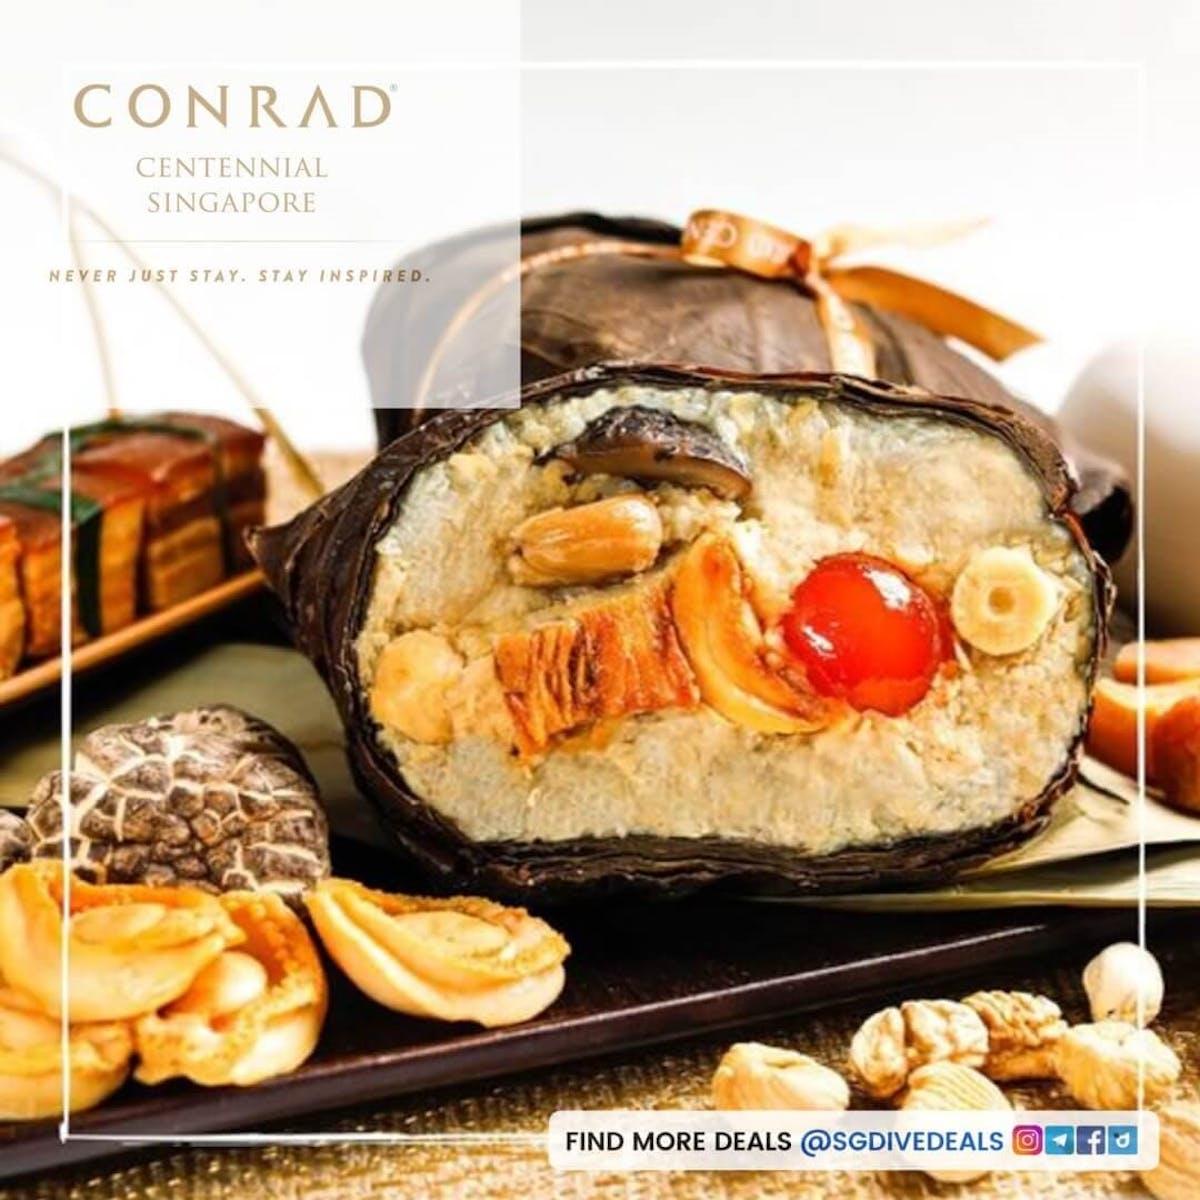 Golden Peony Singapore Black Pepper Chili Crab, Prawn and Bedford Scallops Rice Dumpling 辣 椒 蚧 法 囯 帶 子 粽